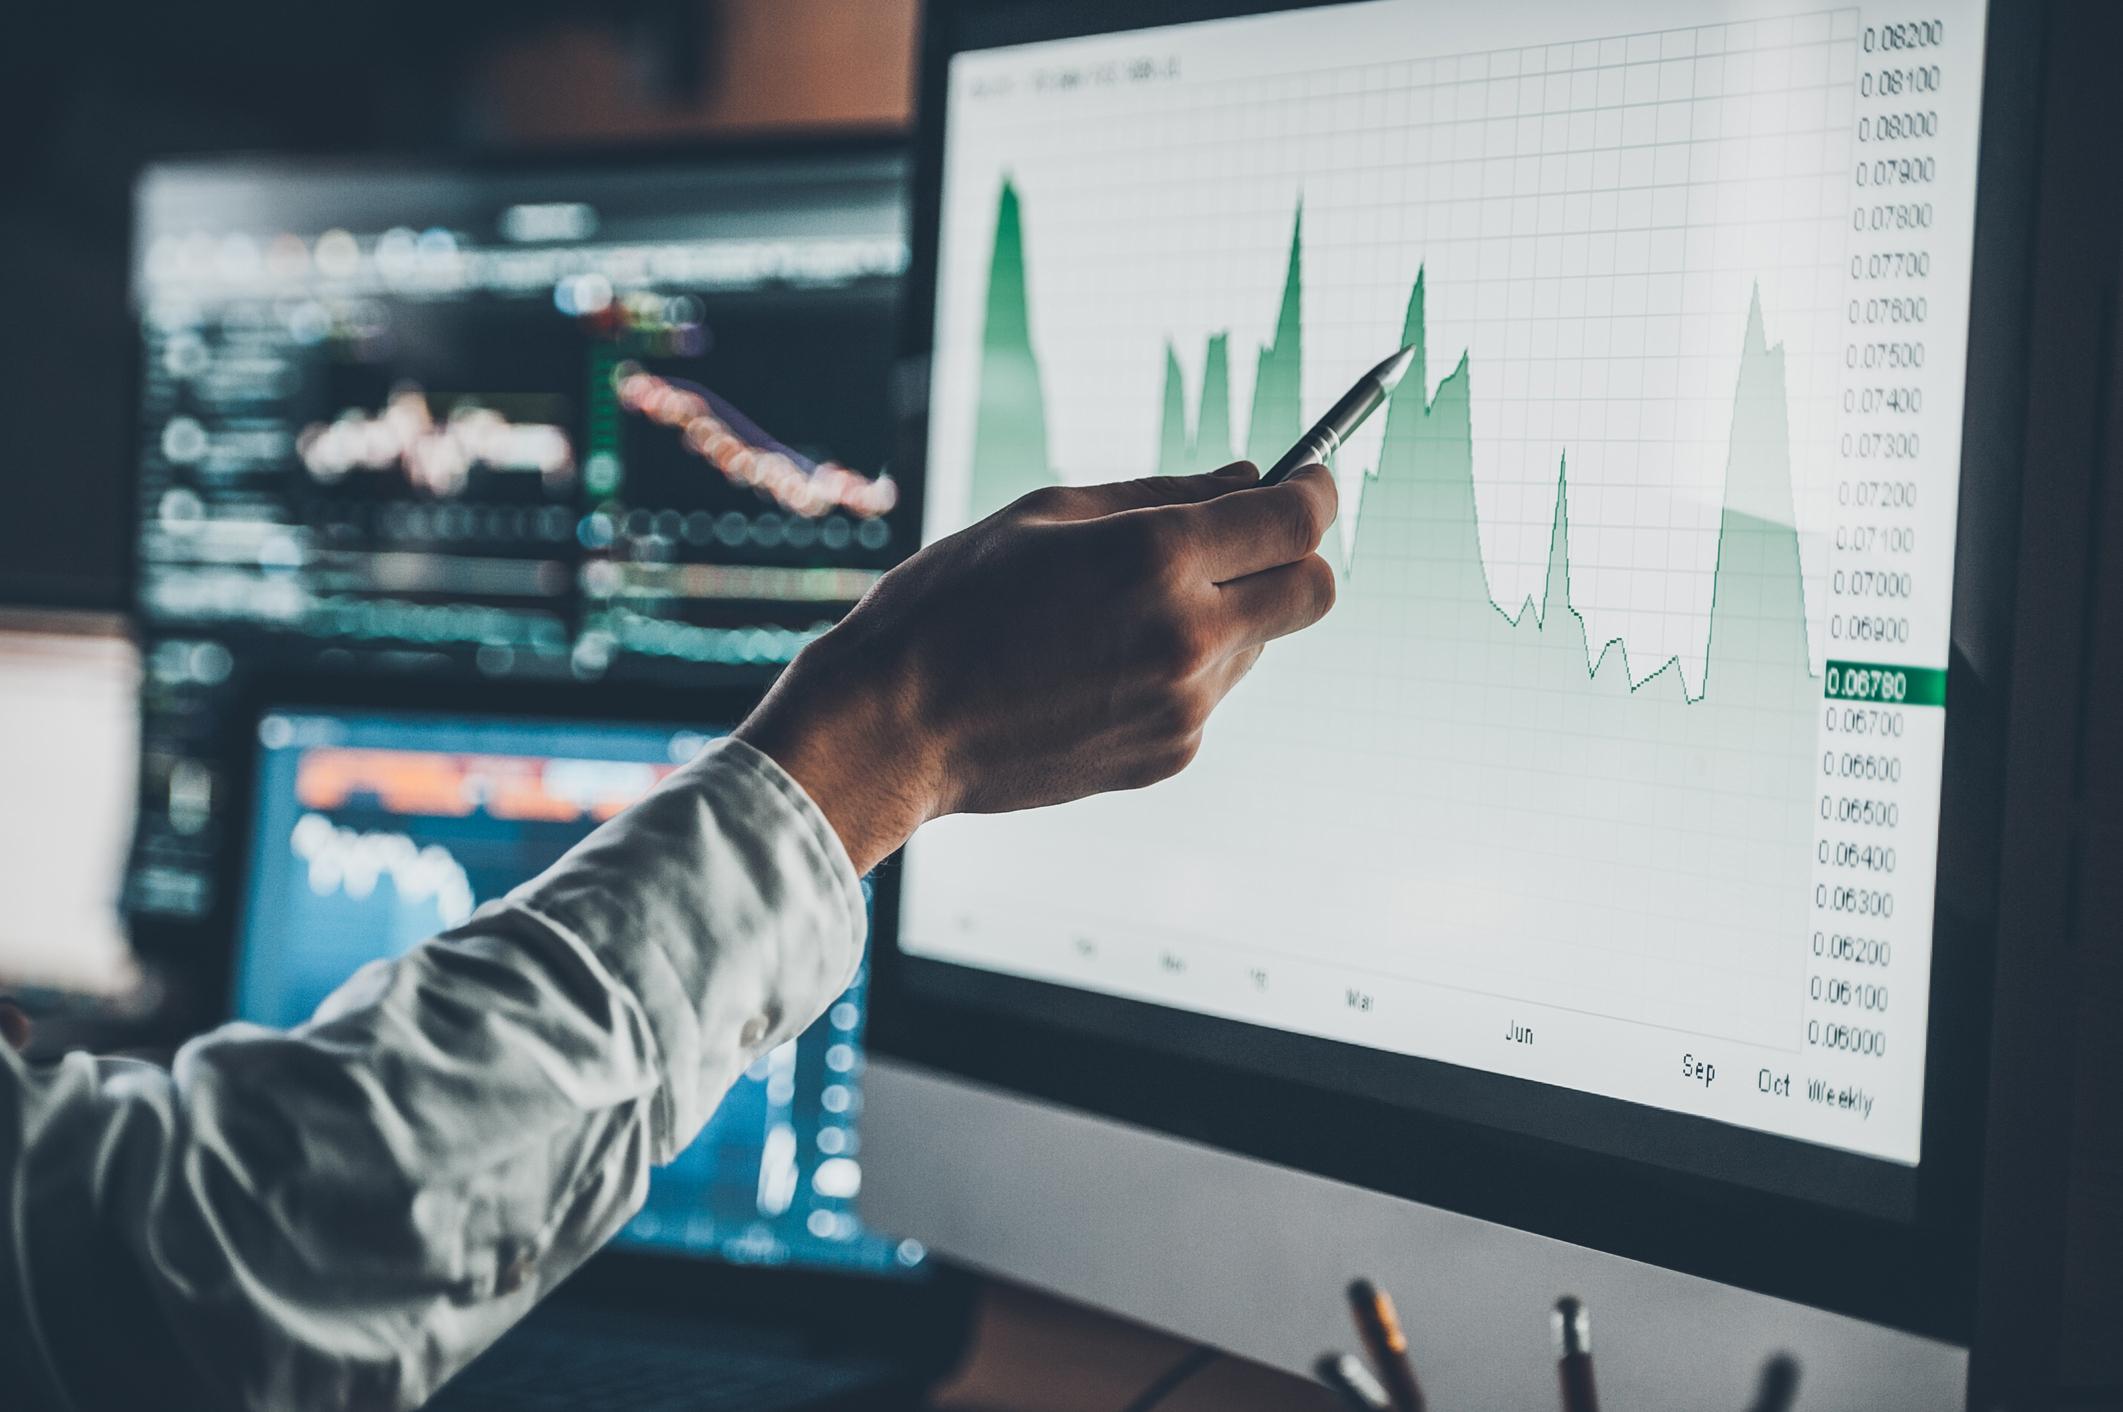 3 Reasons I Bought 3M Stock Despite Investor Fears